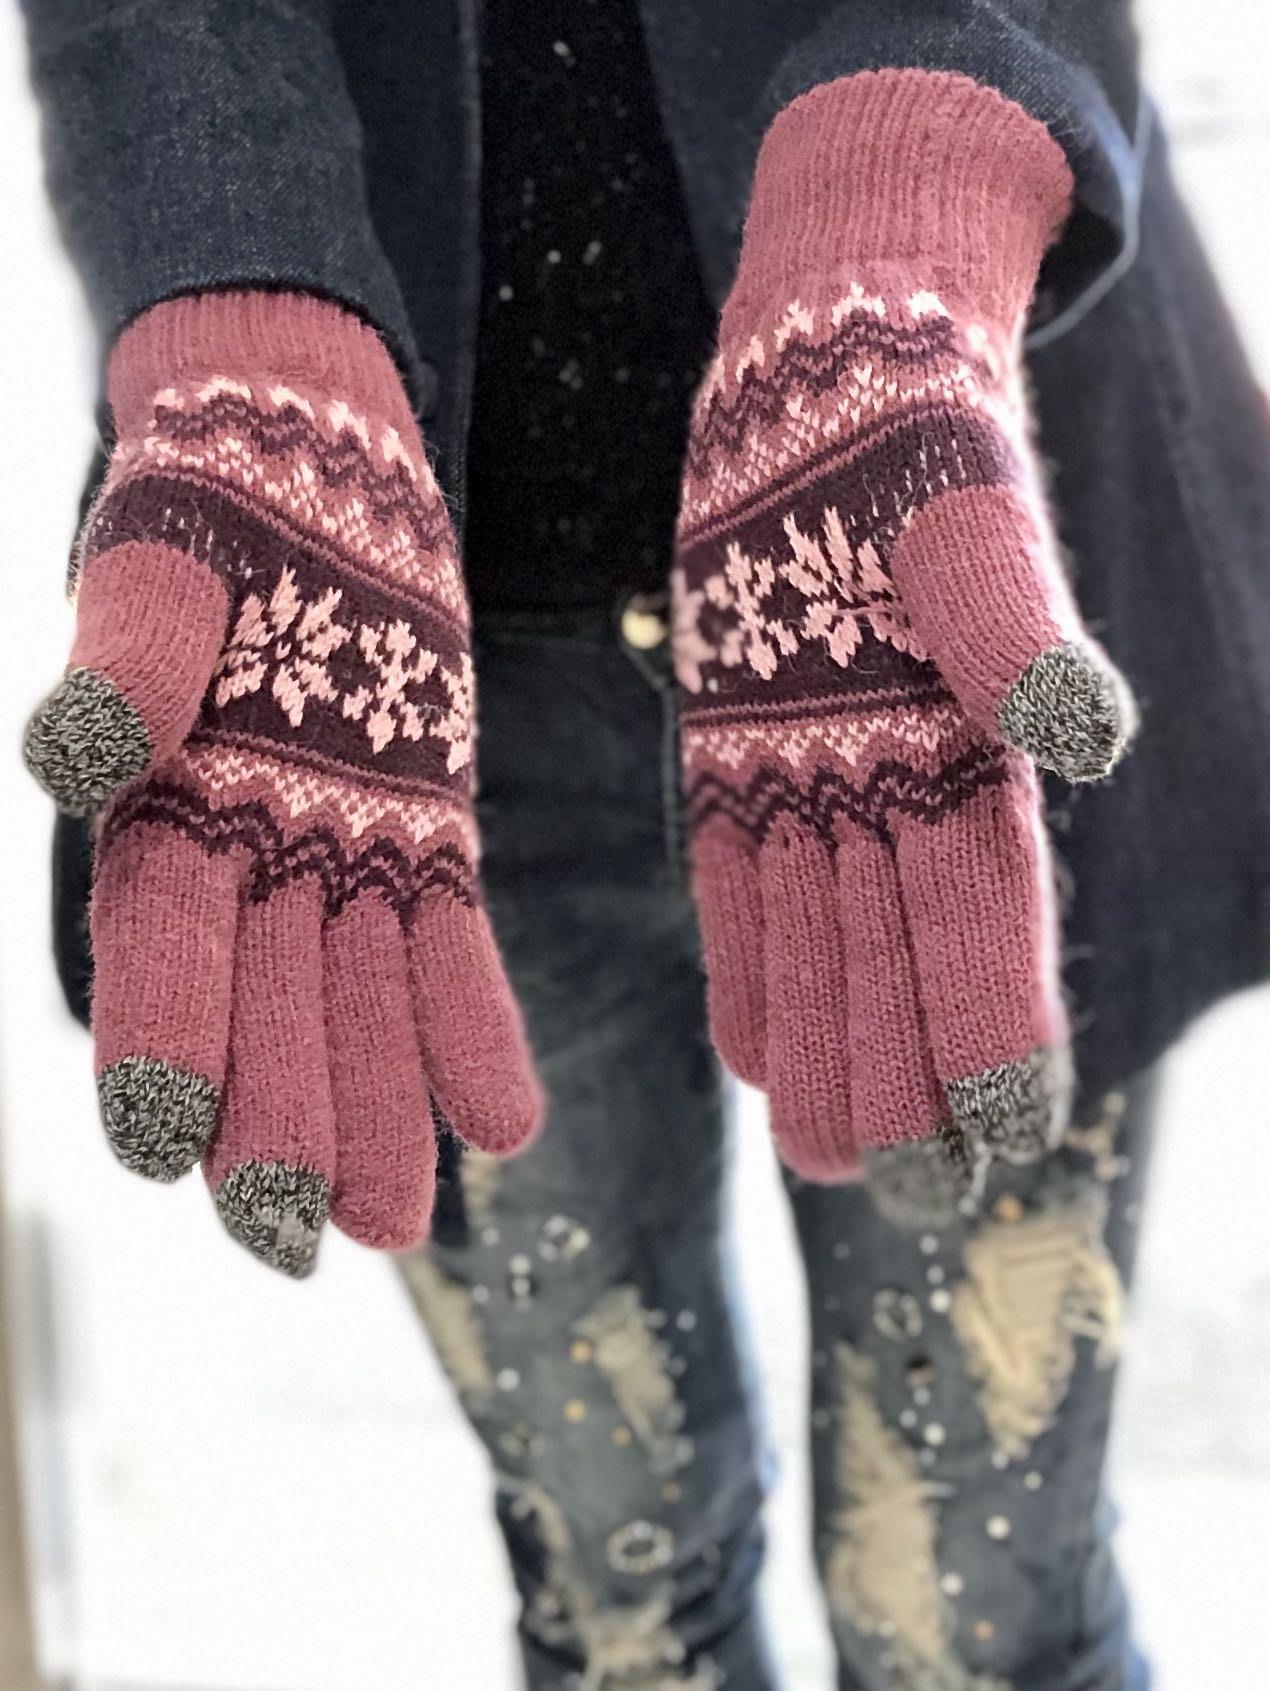 Muji 類似款 觸控手套 台灣製 高品質絨布加厚 超保暖毛針織手套 《熱銷款》